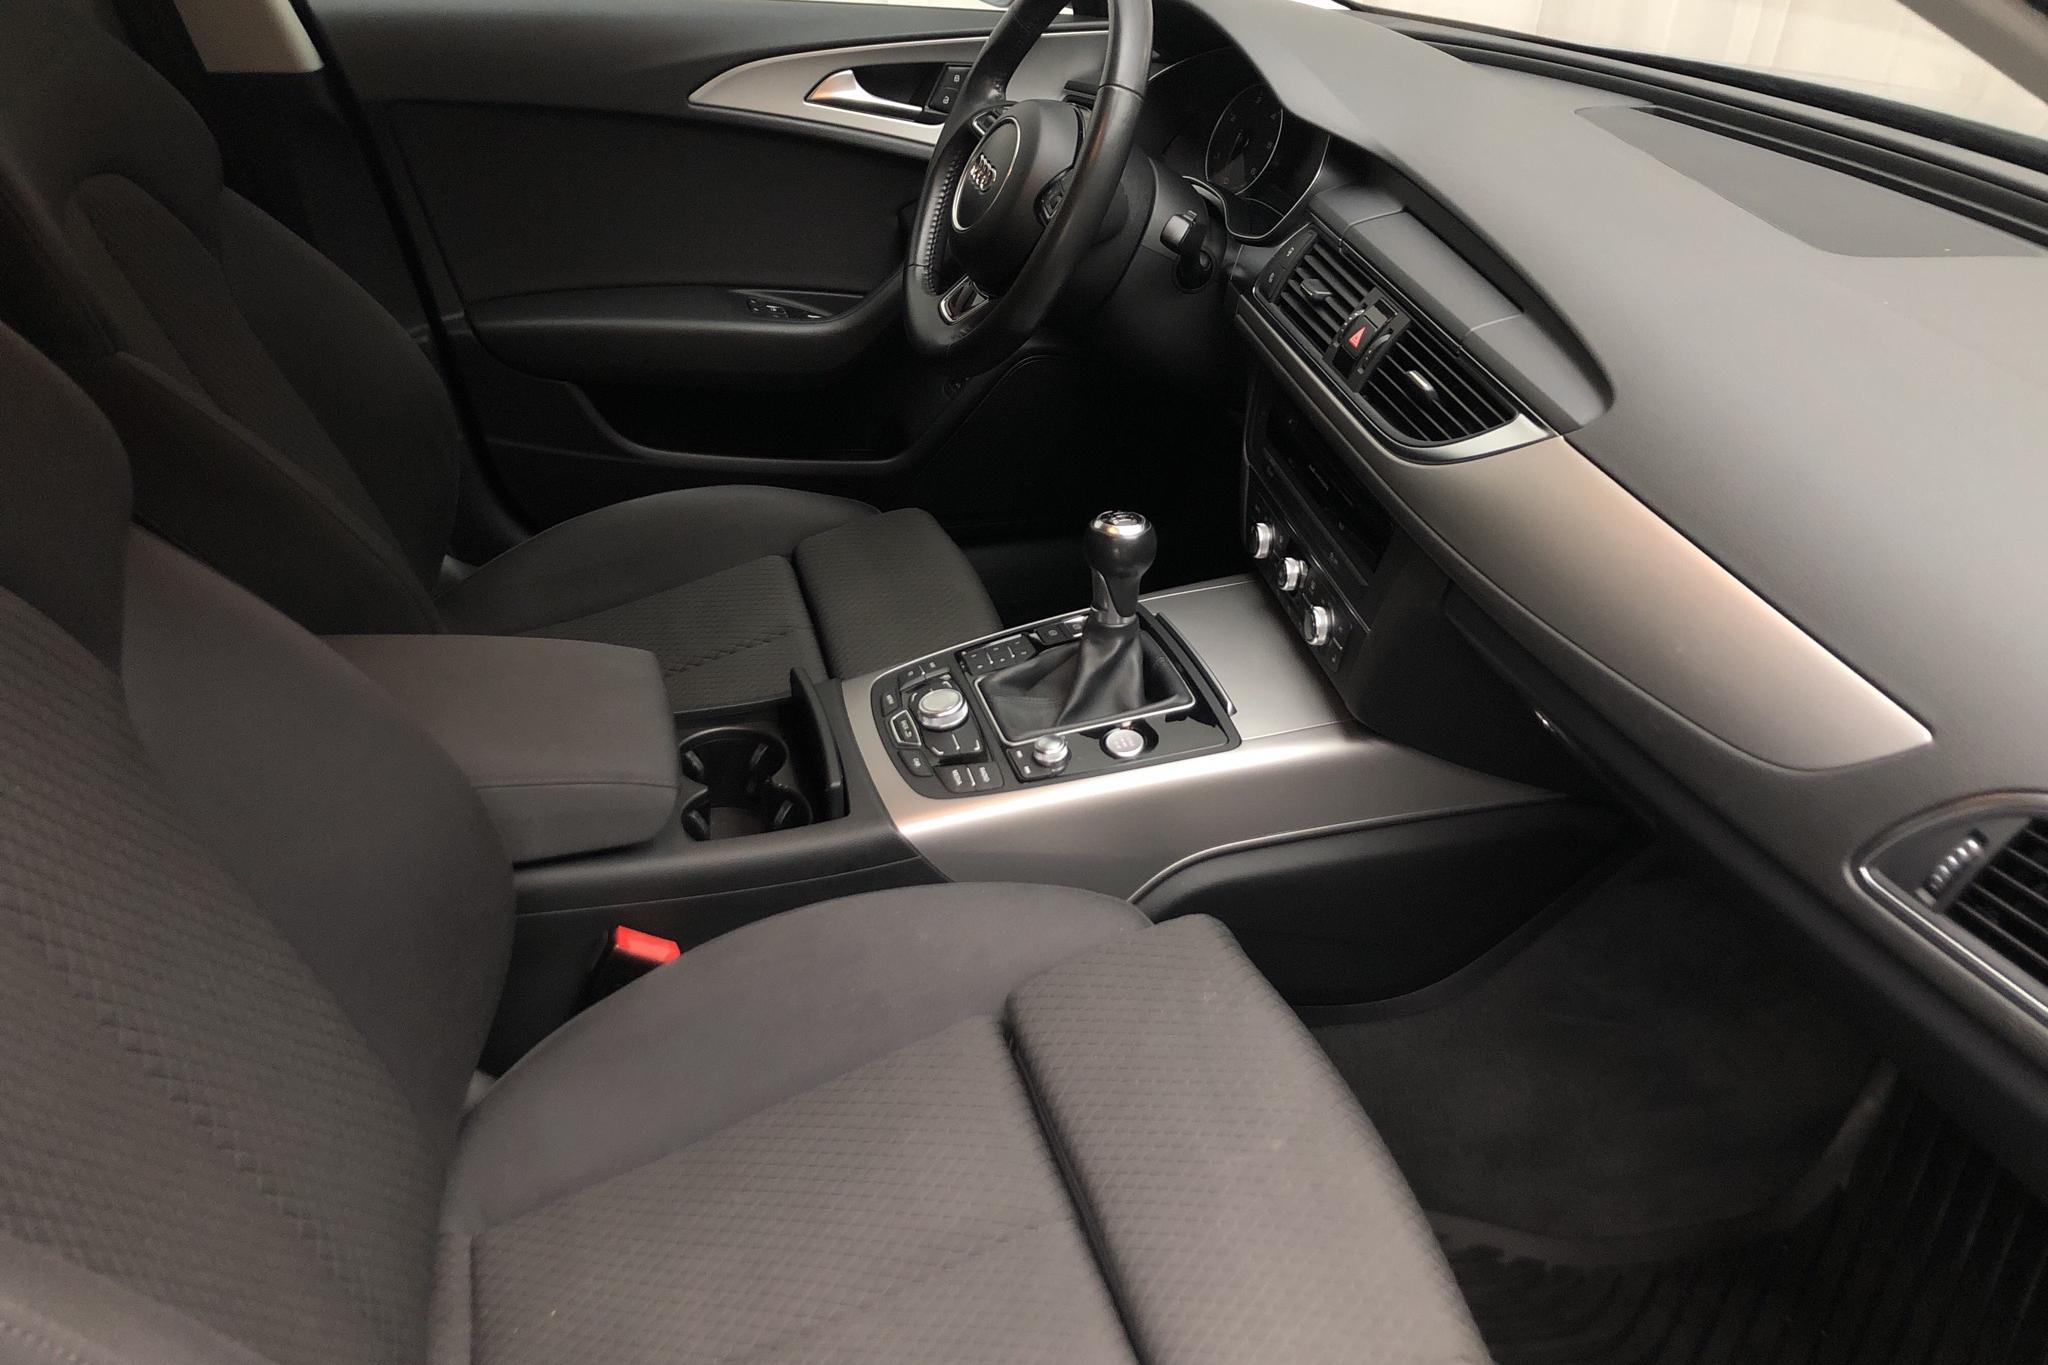 Audi A6 2.0 TDI Avant (177hk) - 166 000 km - Manual - gray - 2012